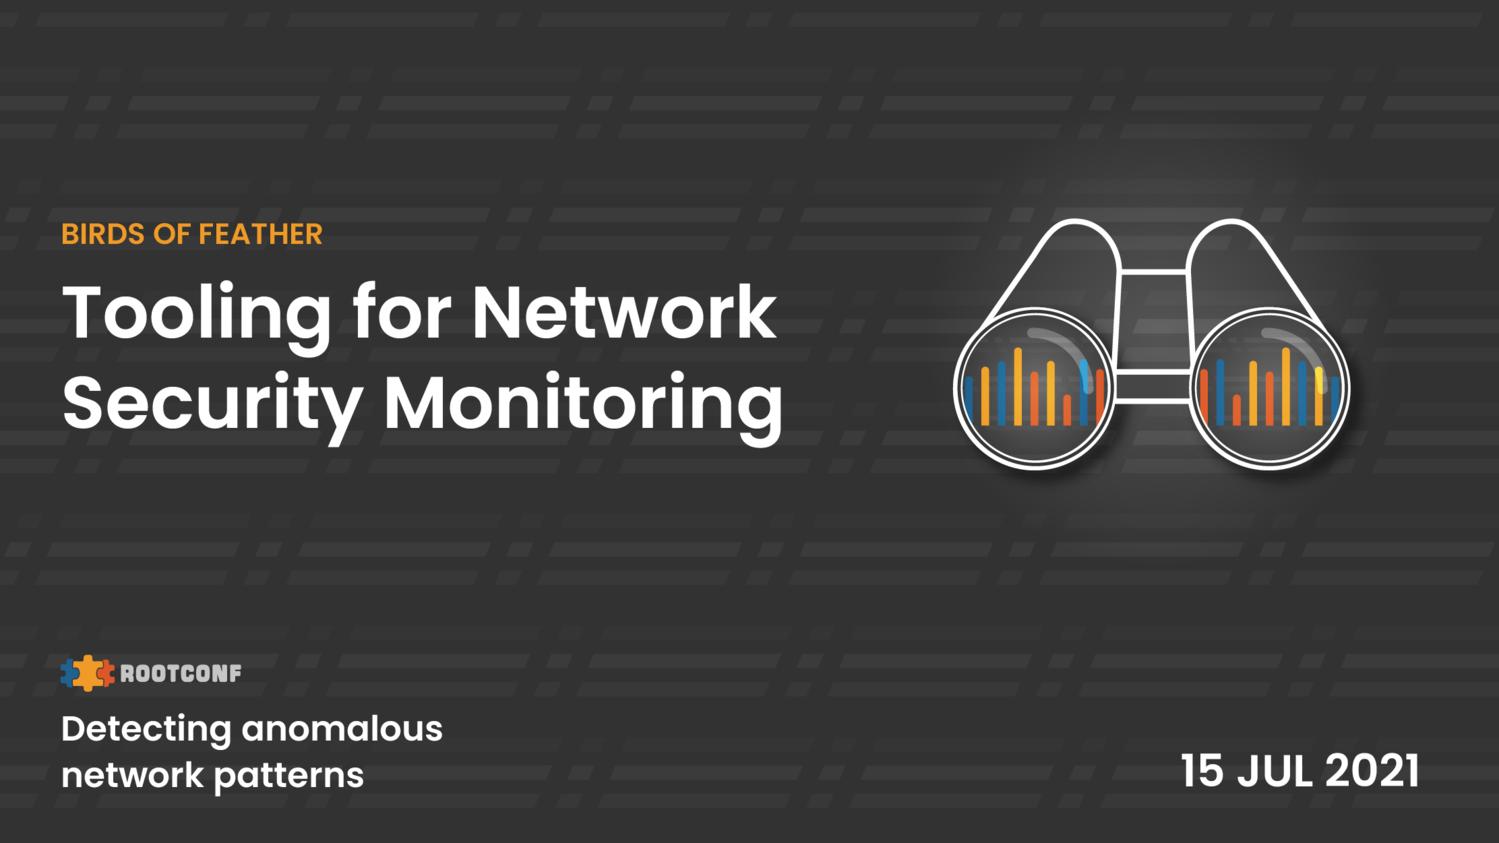 Detecting anomalous network patterns